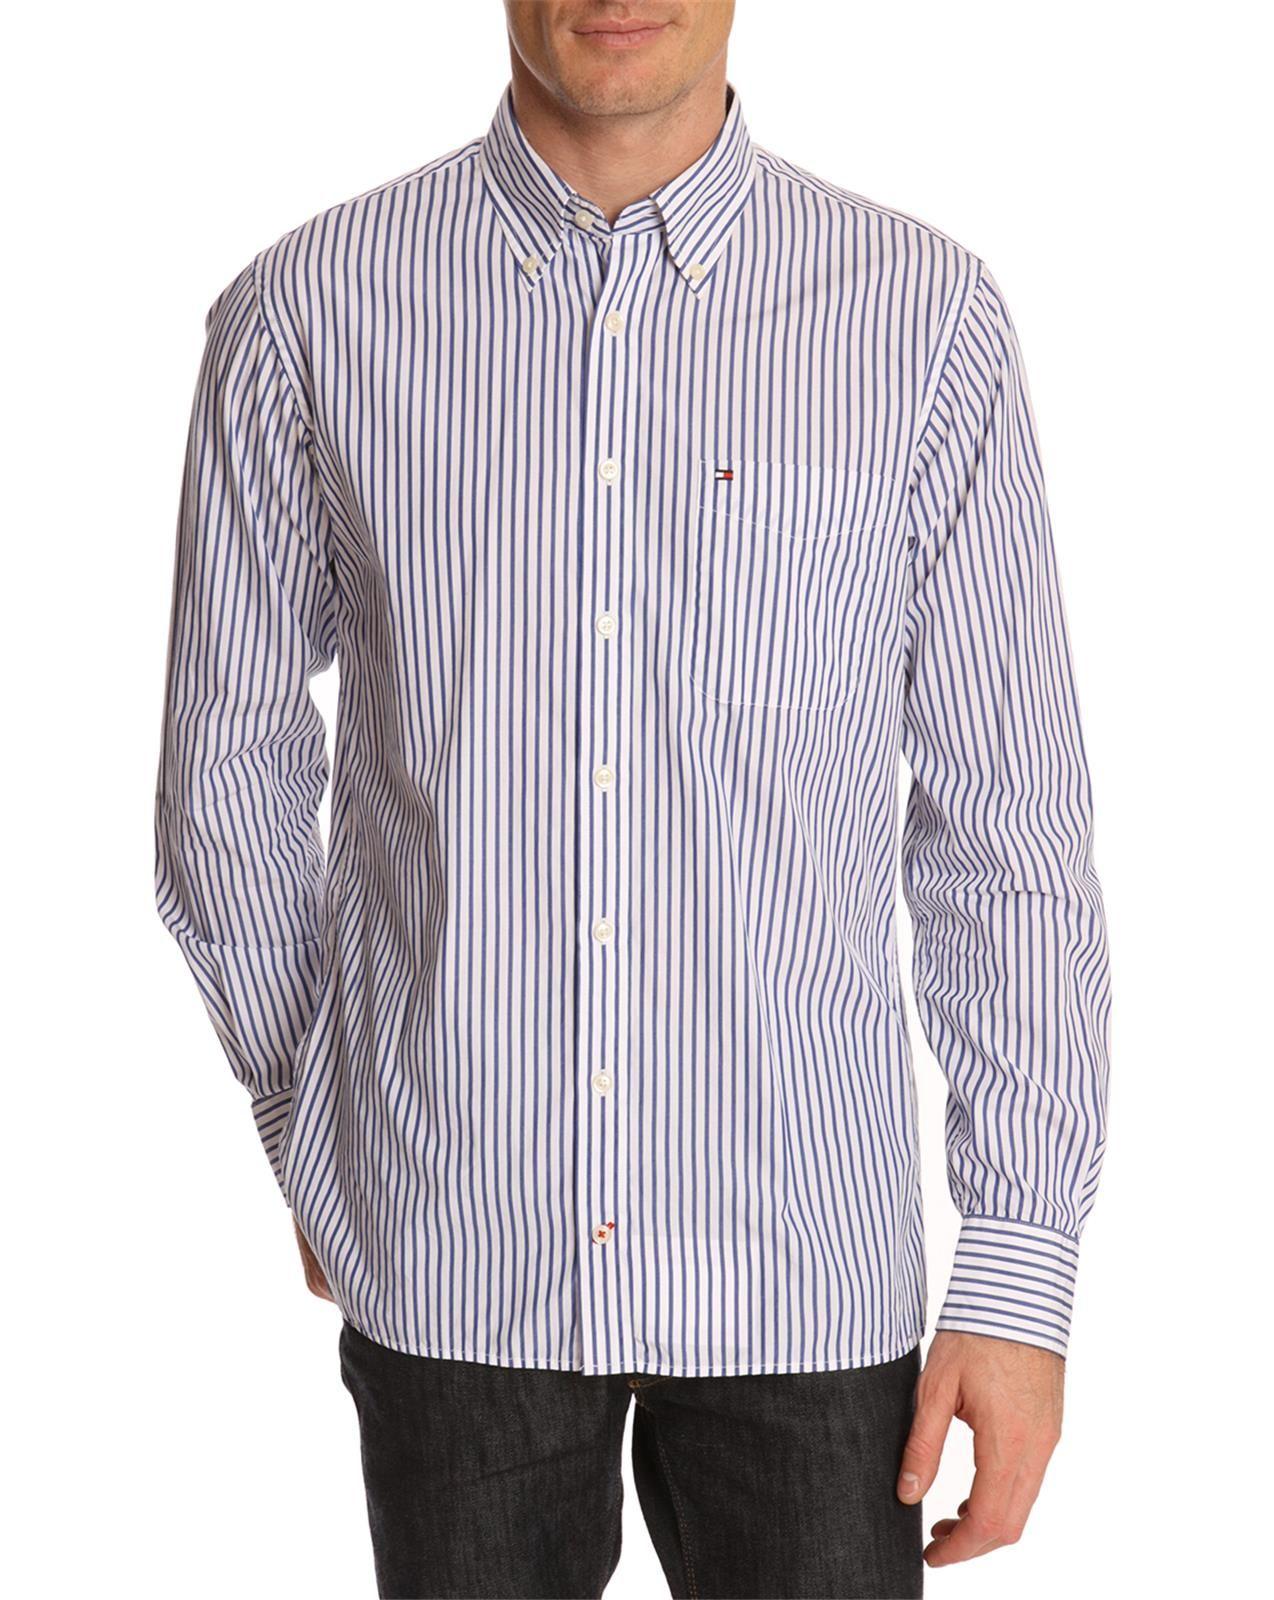 Striped White Shirt | Is Shirt